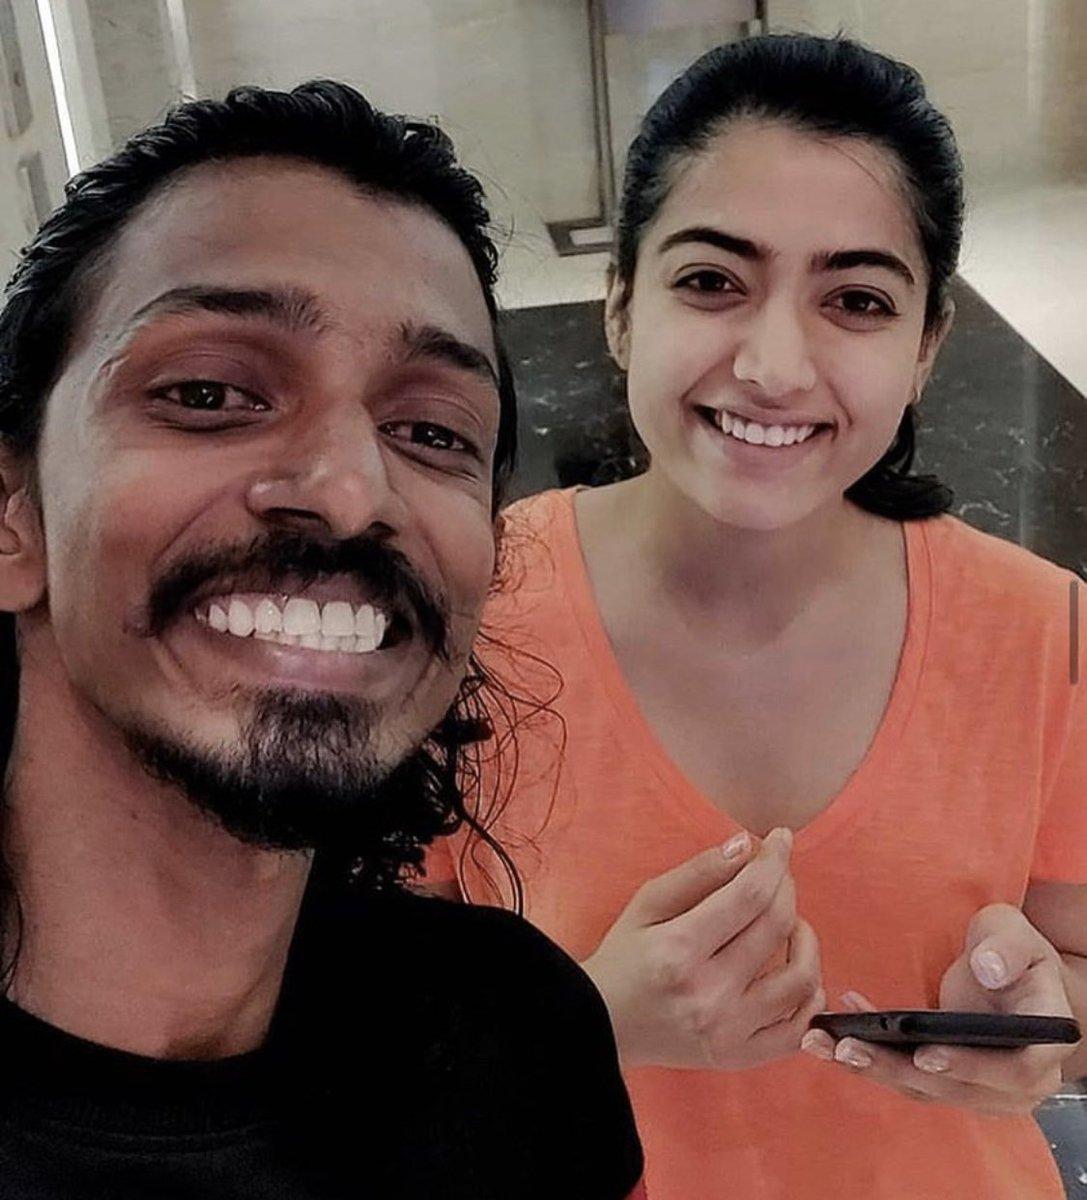 Selfie With Photographer..!!  KochiLove @iamRashmika #DearComradeMusicFestival #RashmikaMandanna pic.twitter.com/coeOQHEFH7